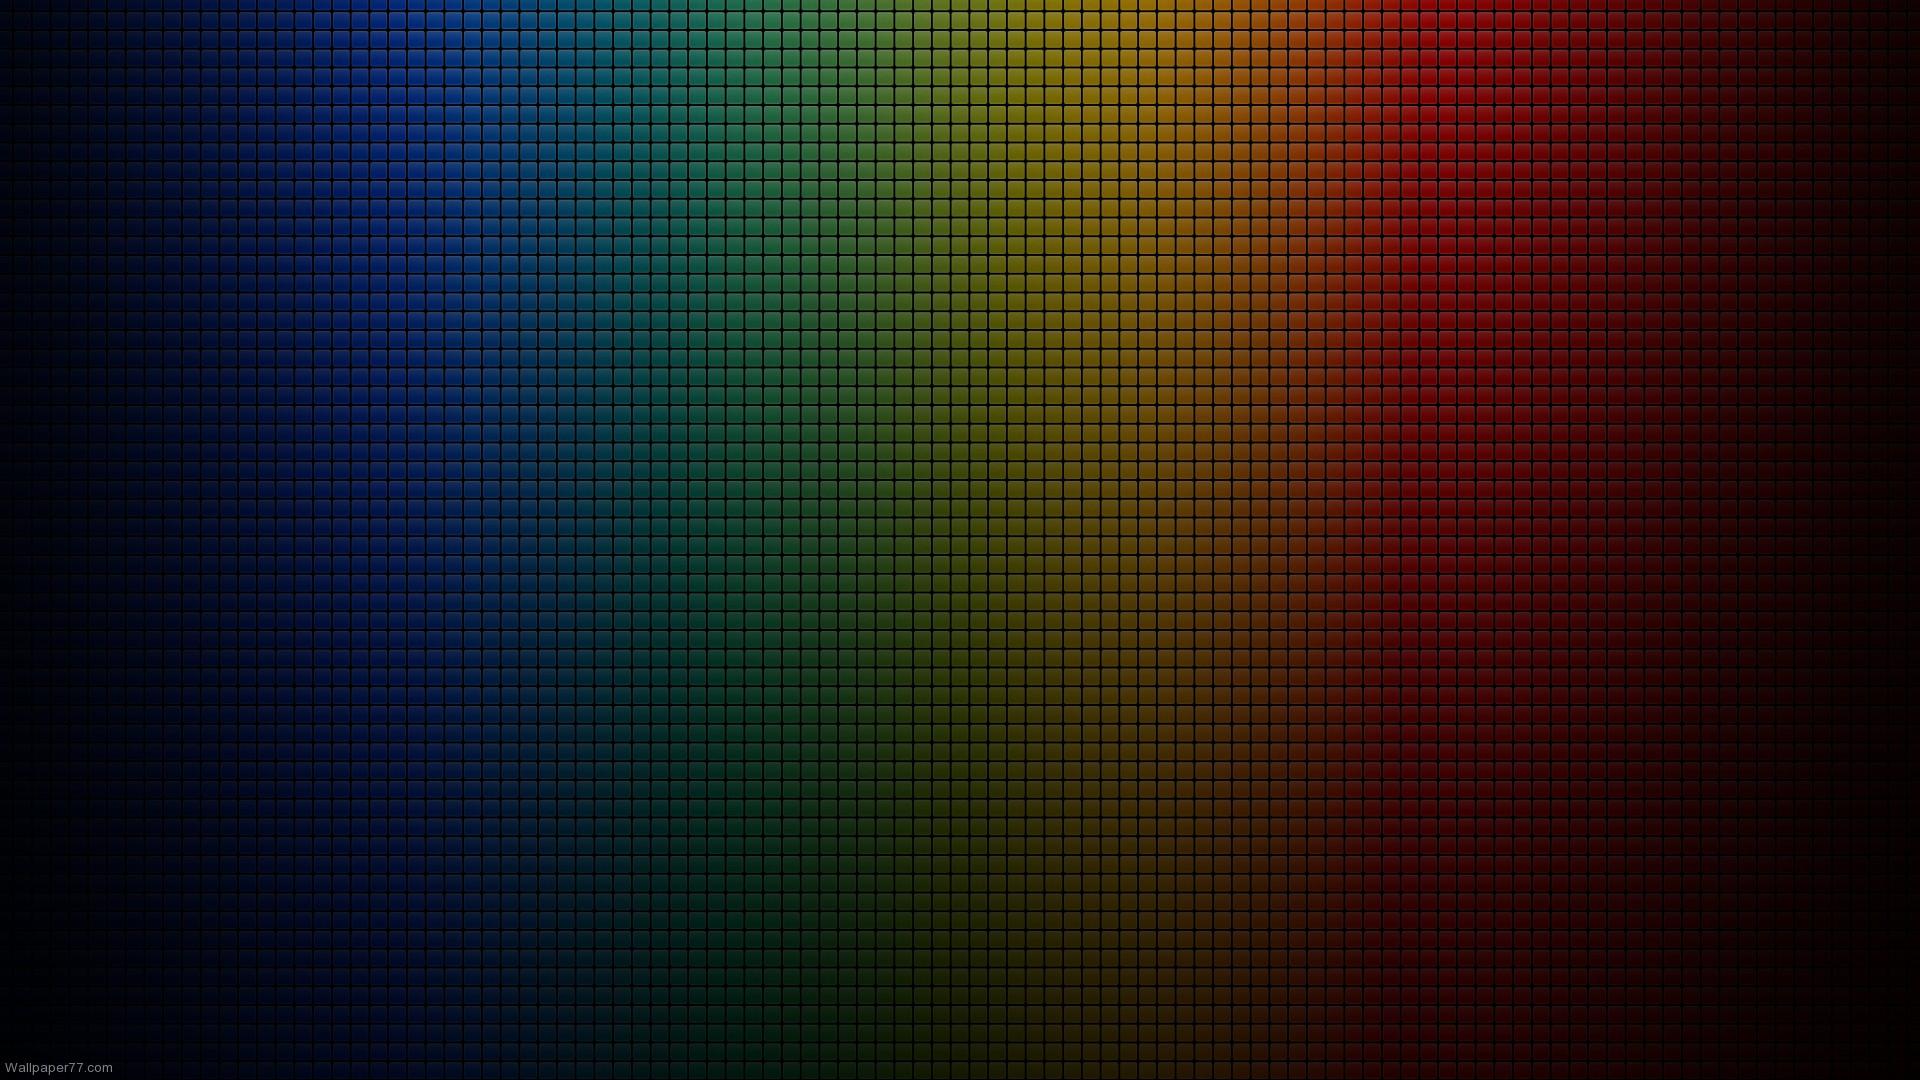 Retina ipad 3 wallpaper ipad wallpaper retina display wallpaper the 1920x1080